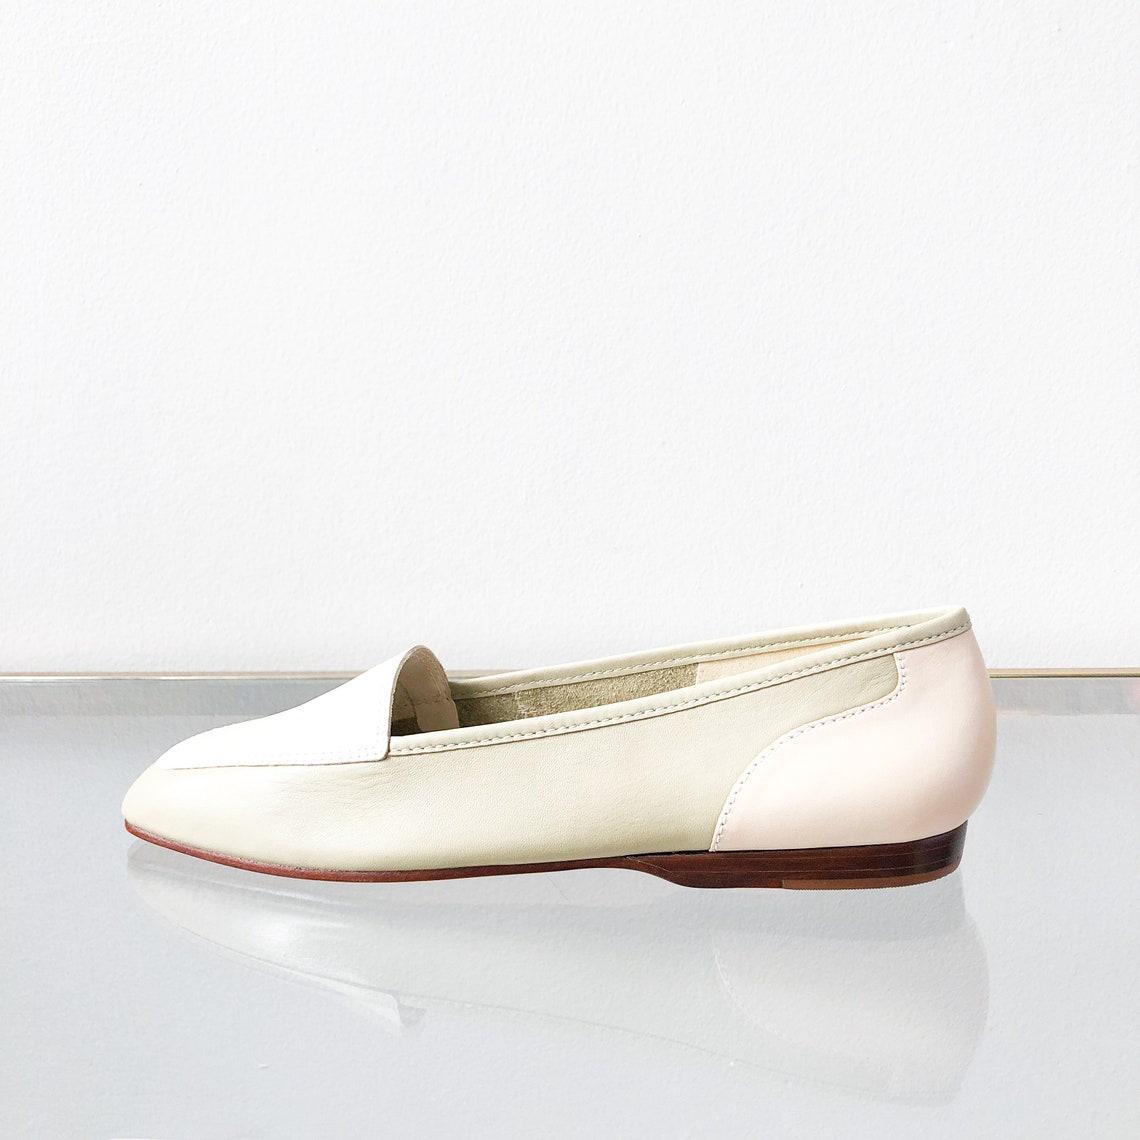 90's Sage Cream Leather Flats / Square Toe Size 9 - Big Sale dPXxR